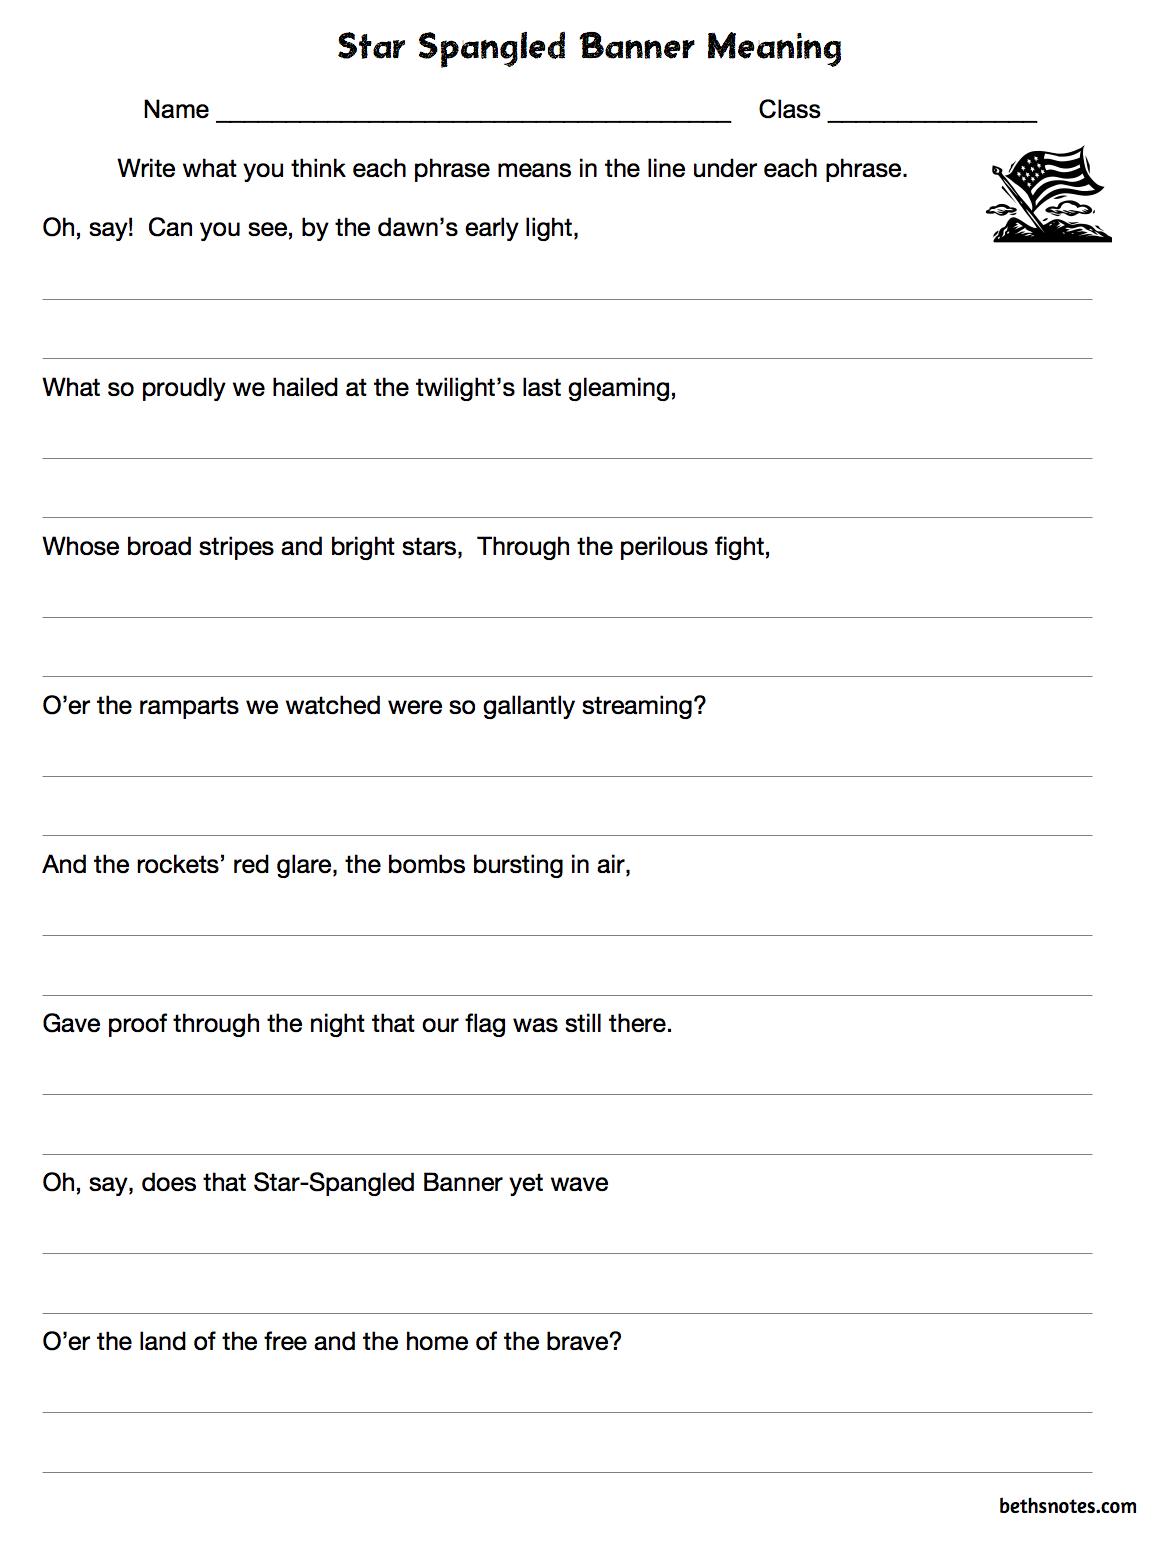 worksheet: Star Spangled Banner Worksheets The Lyrics Worksheet ...